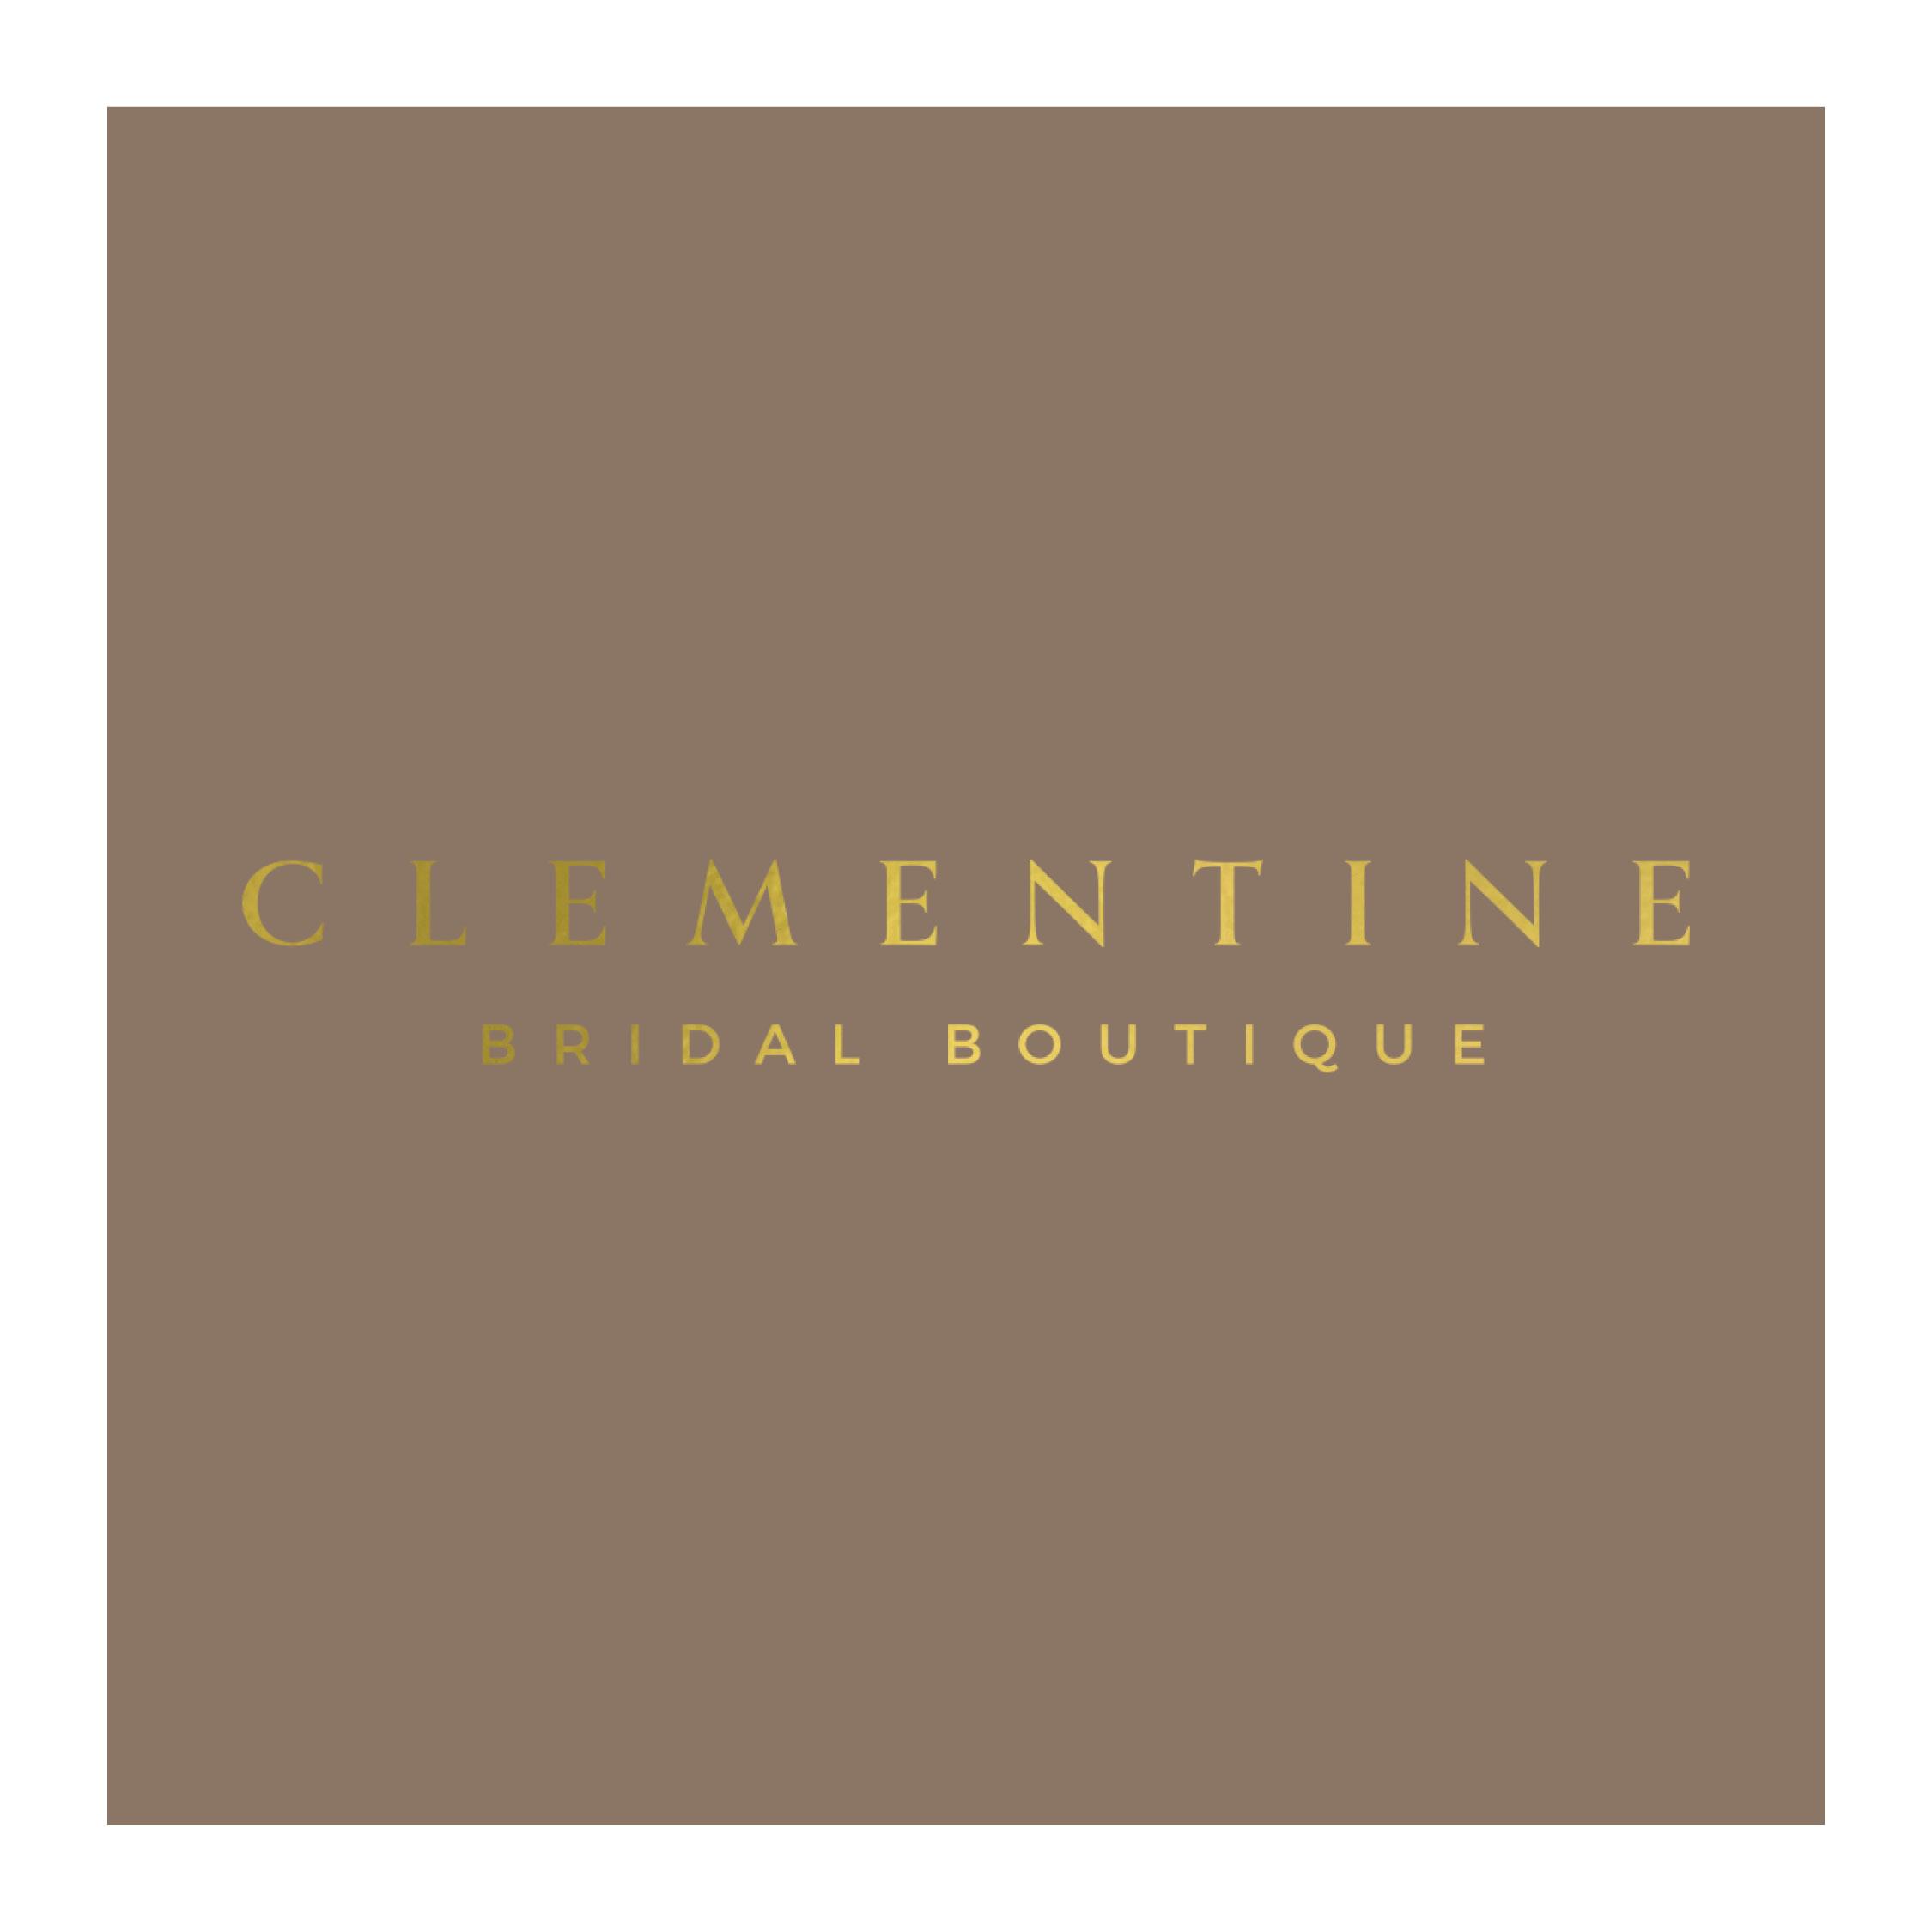 Clementine Insta squares2.jpg